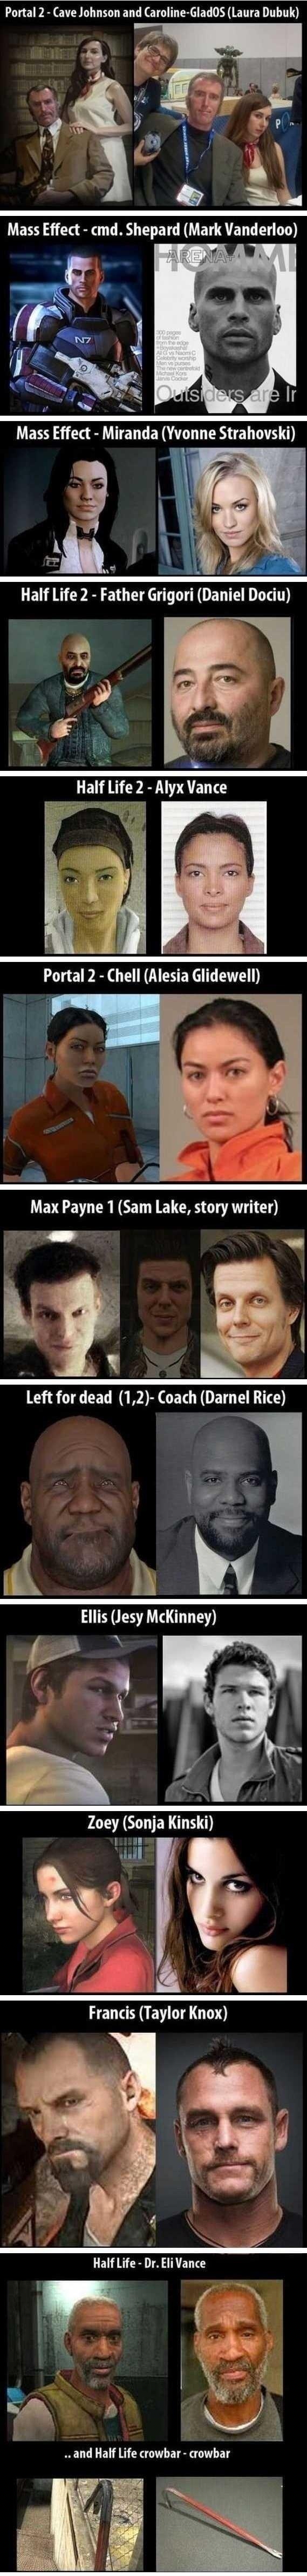 Video game lookalike's. . Portal 2 - Cave Johnson and (Laura DUNK) Left for dead (1, 2)- Coach (Darnel Rice) Ellis (Jew McKinney) i Zoey (Sonja Kinski) Francis